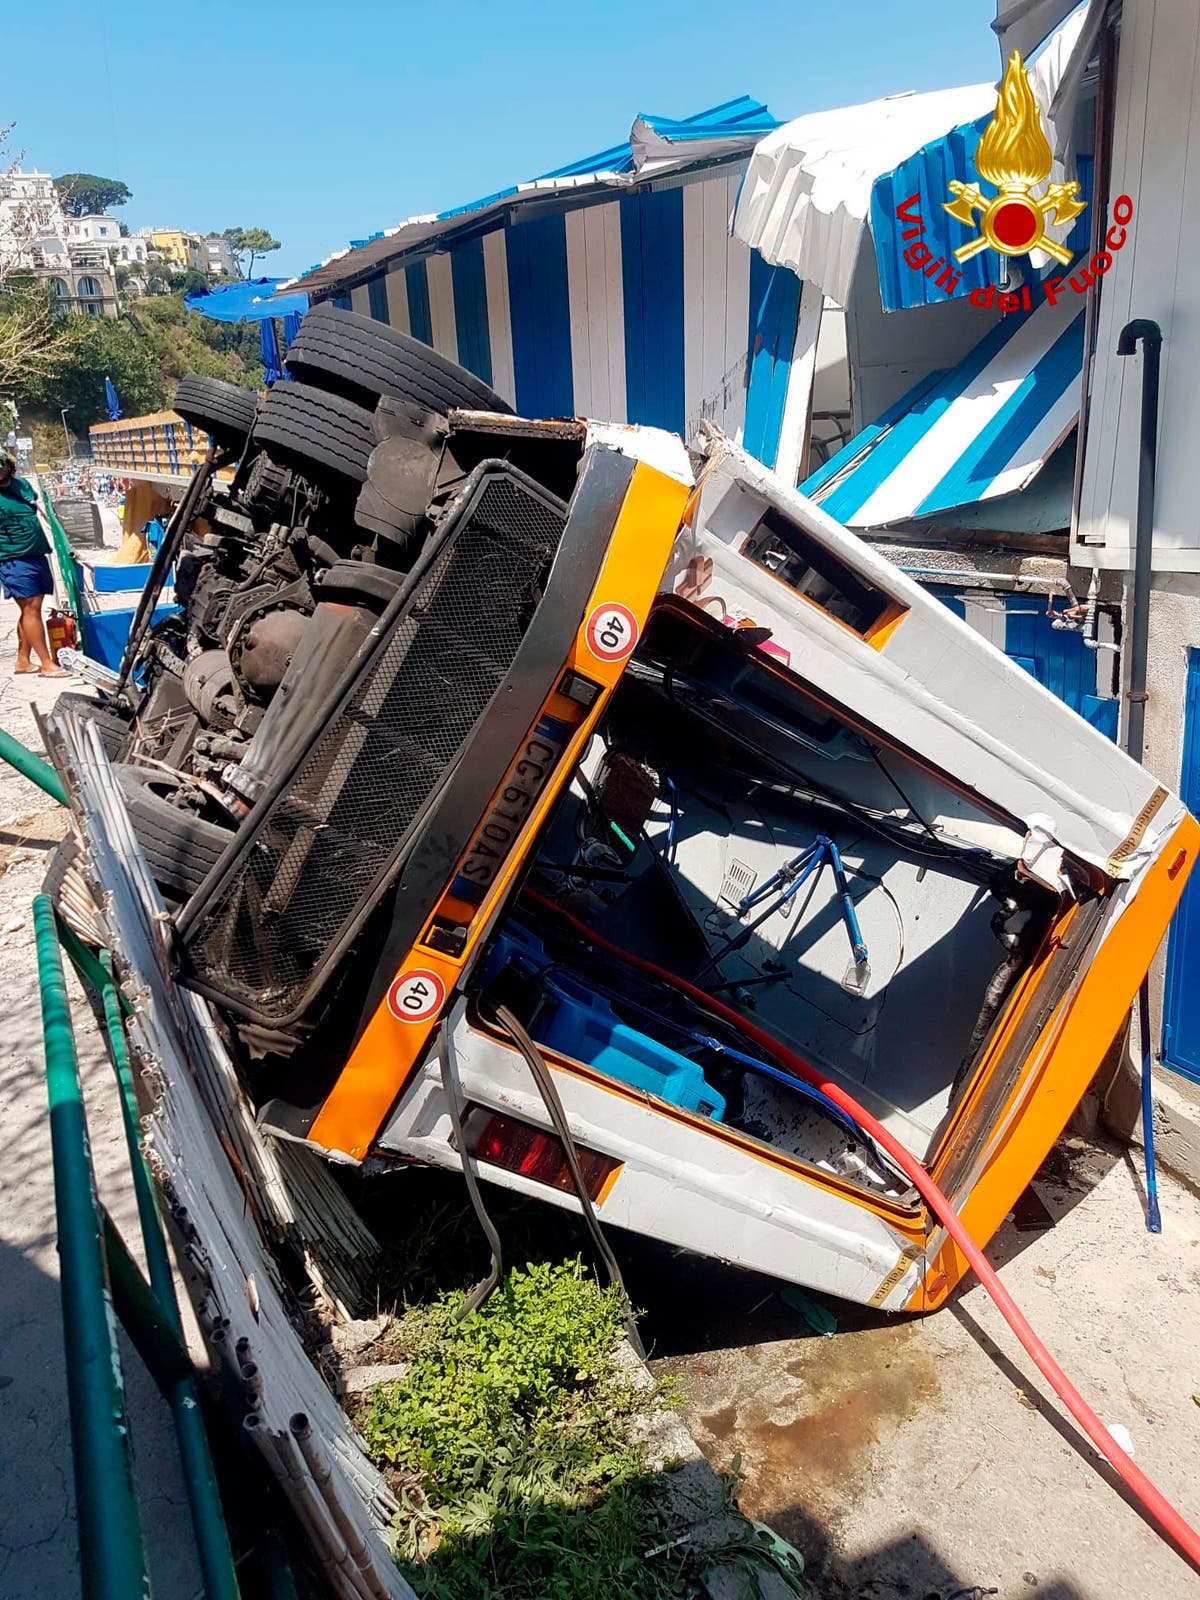 Bus plunges off road on Capri, lands near beach; driver dies